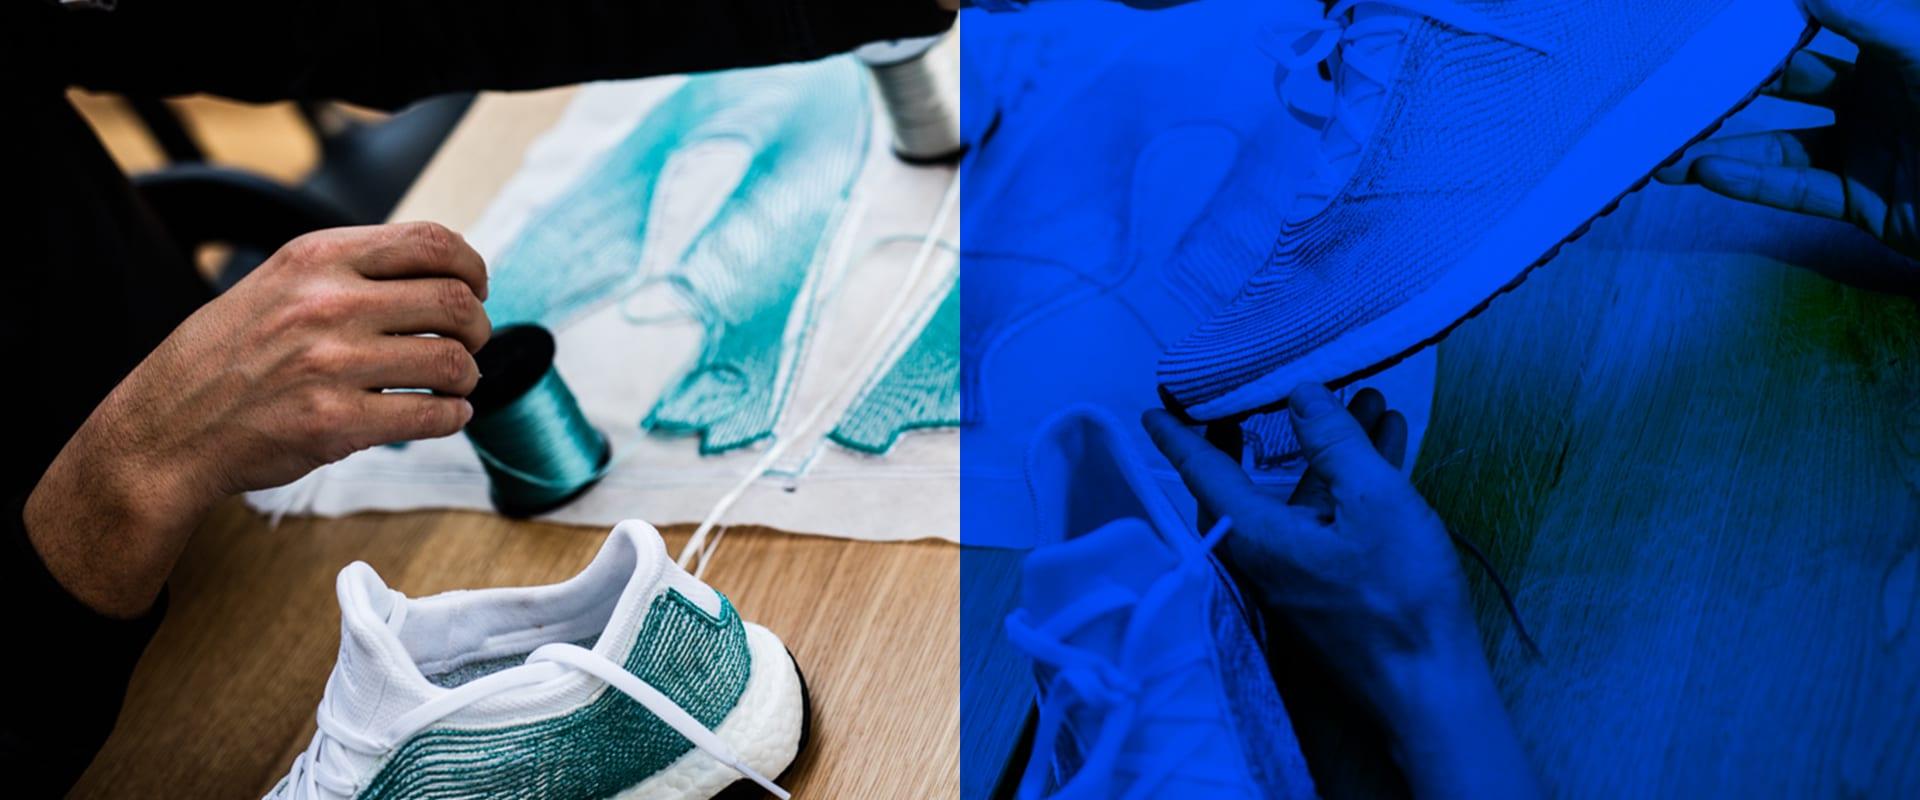 Polyester Textile Adidas Shop RecyclingRecycled Official QrCxtsdhB